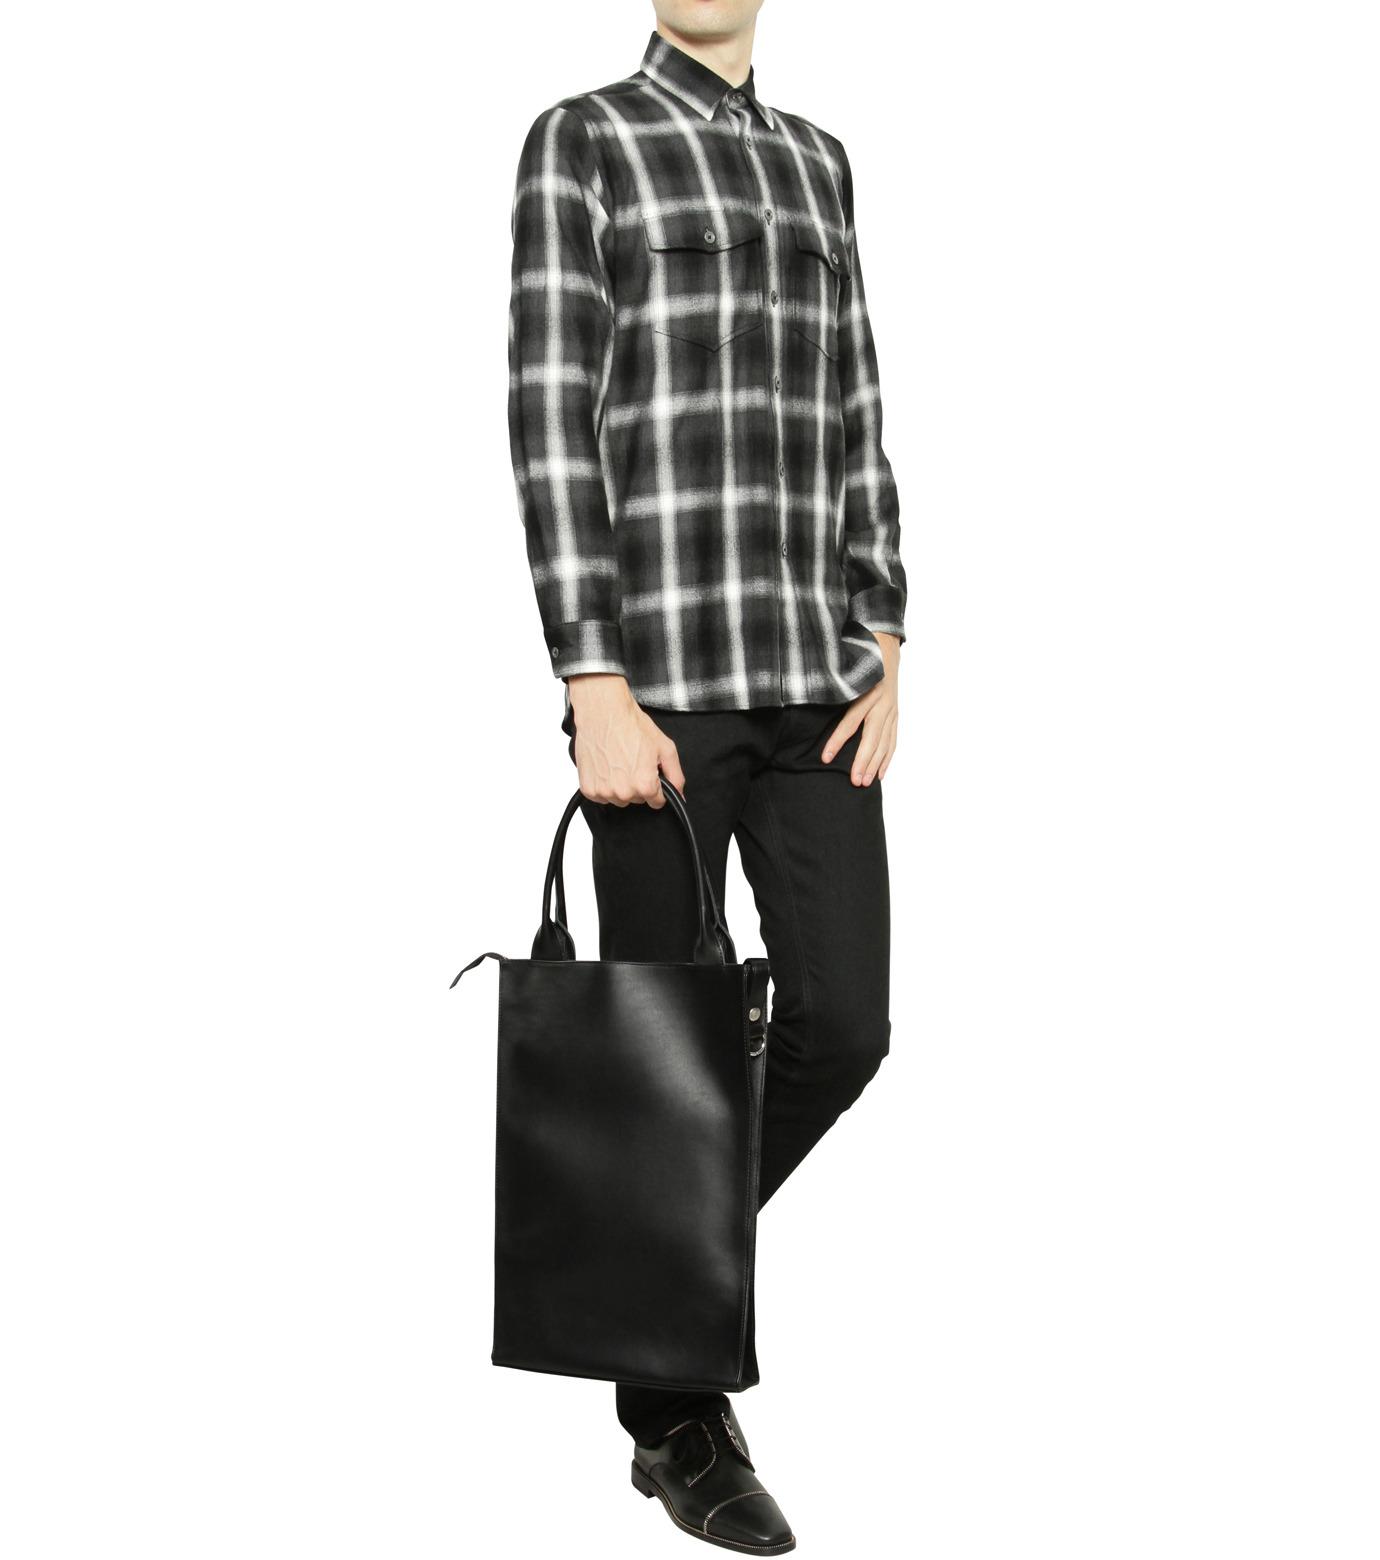 HL HEDDIE LOVU(エイチエル・エディールーヴ)のHL Tote Bag-BLACK(バッグ/bag)-16A90007-13 拡大詳細画像5